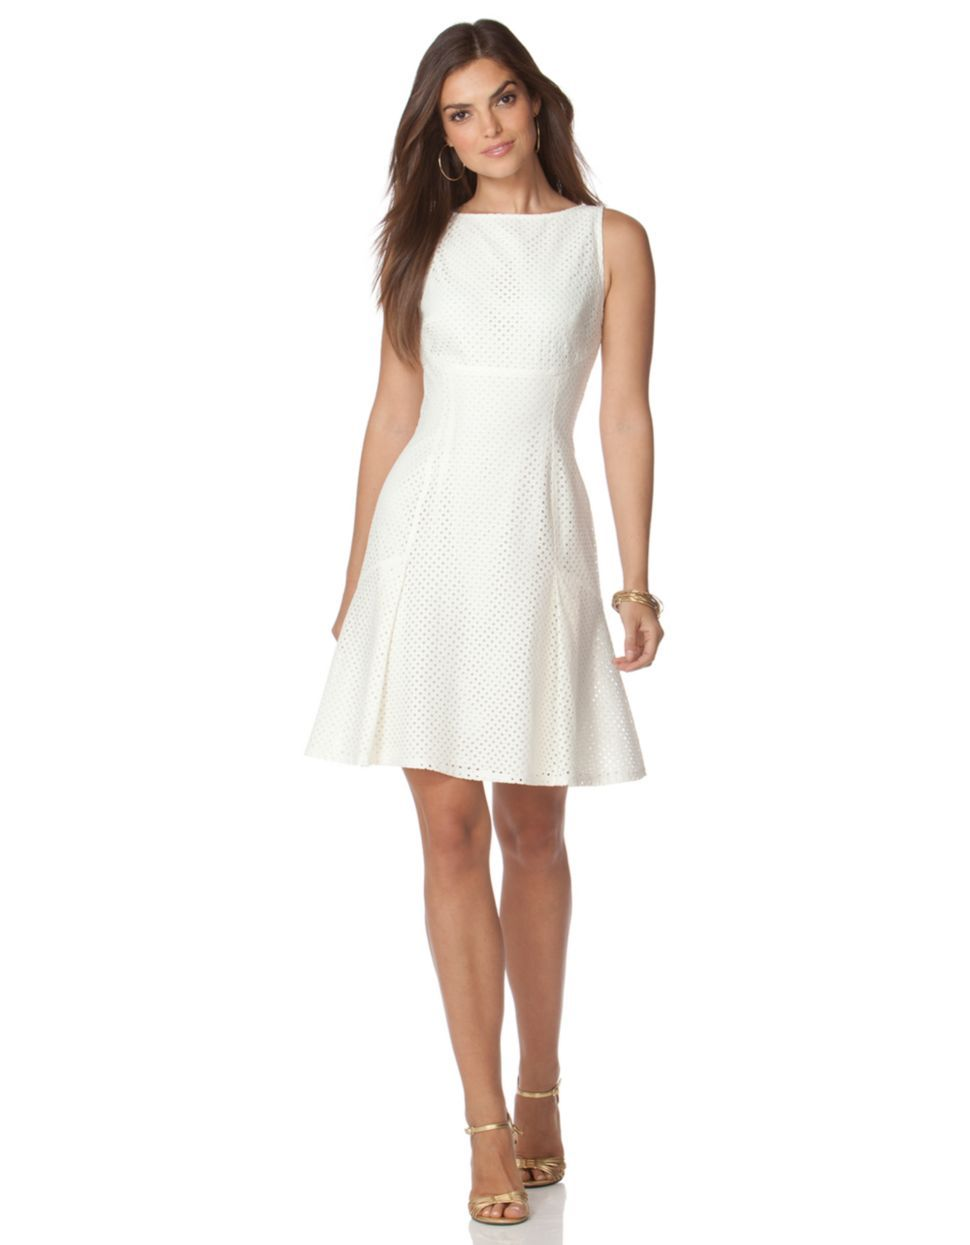 Access Denied Little White Dresses Empire Dress White Dress